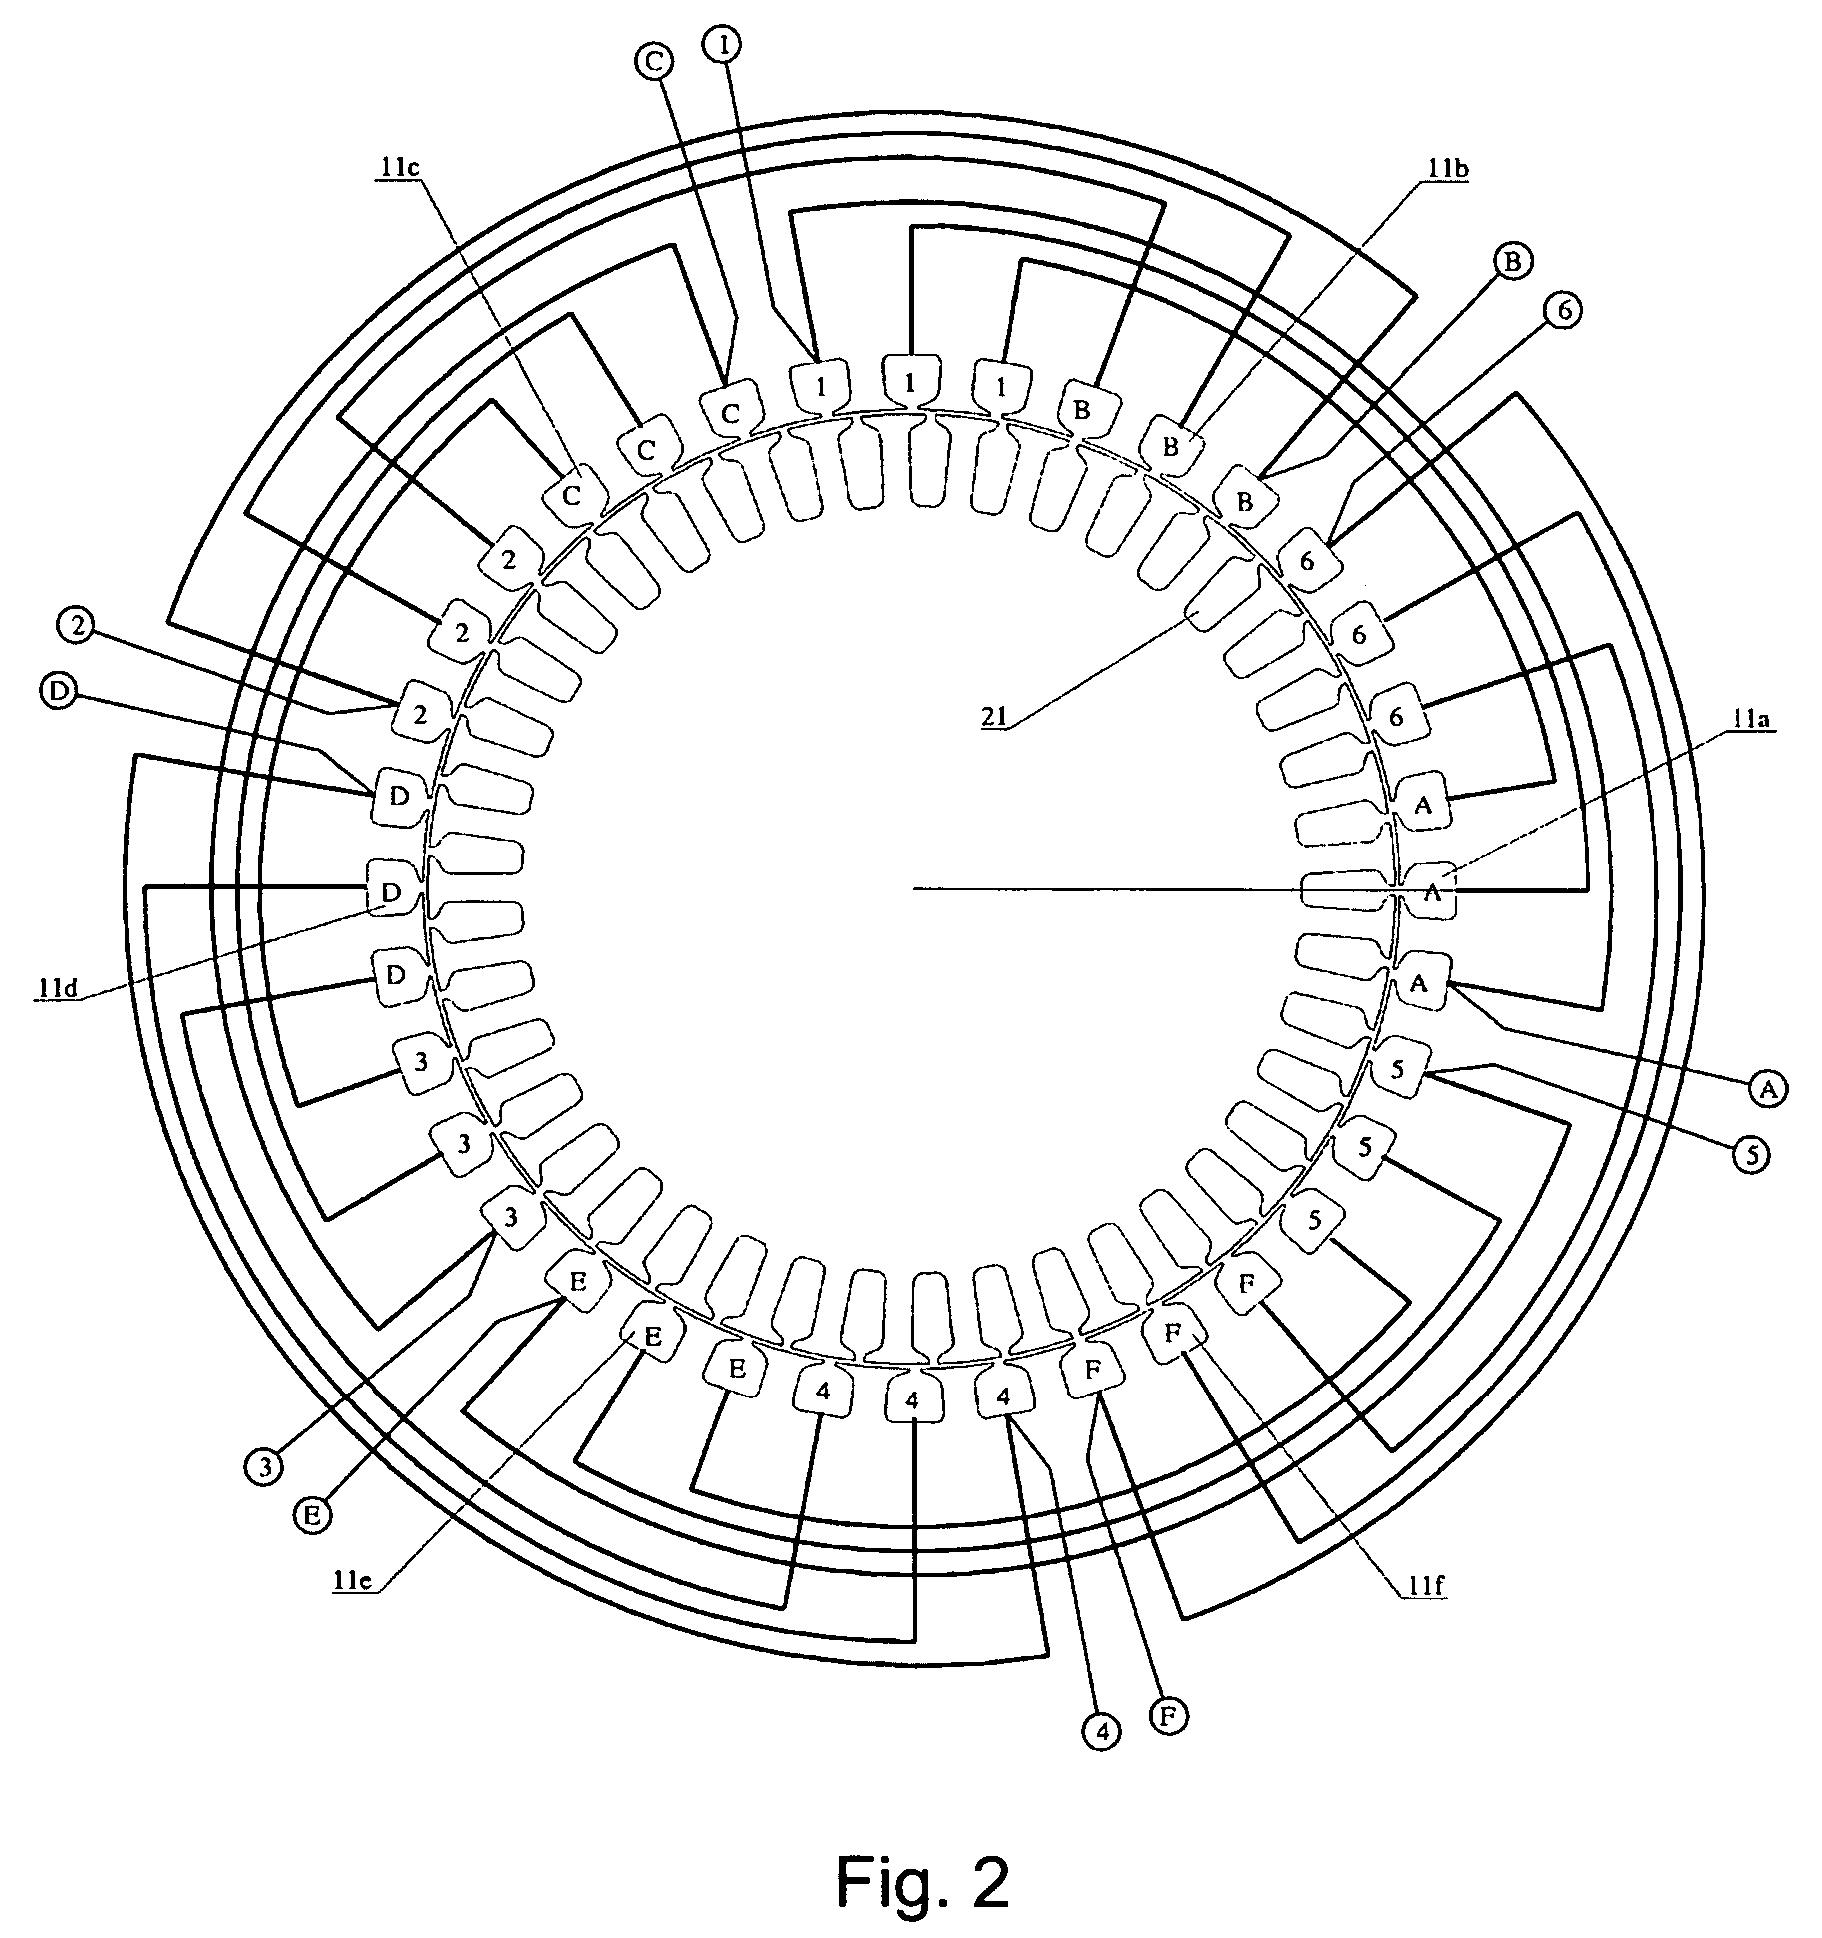 3 Phase Induction Motor Wiring Diagram